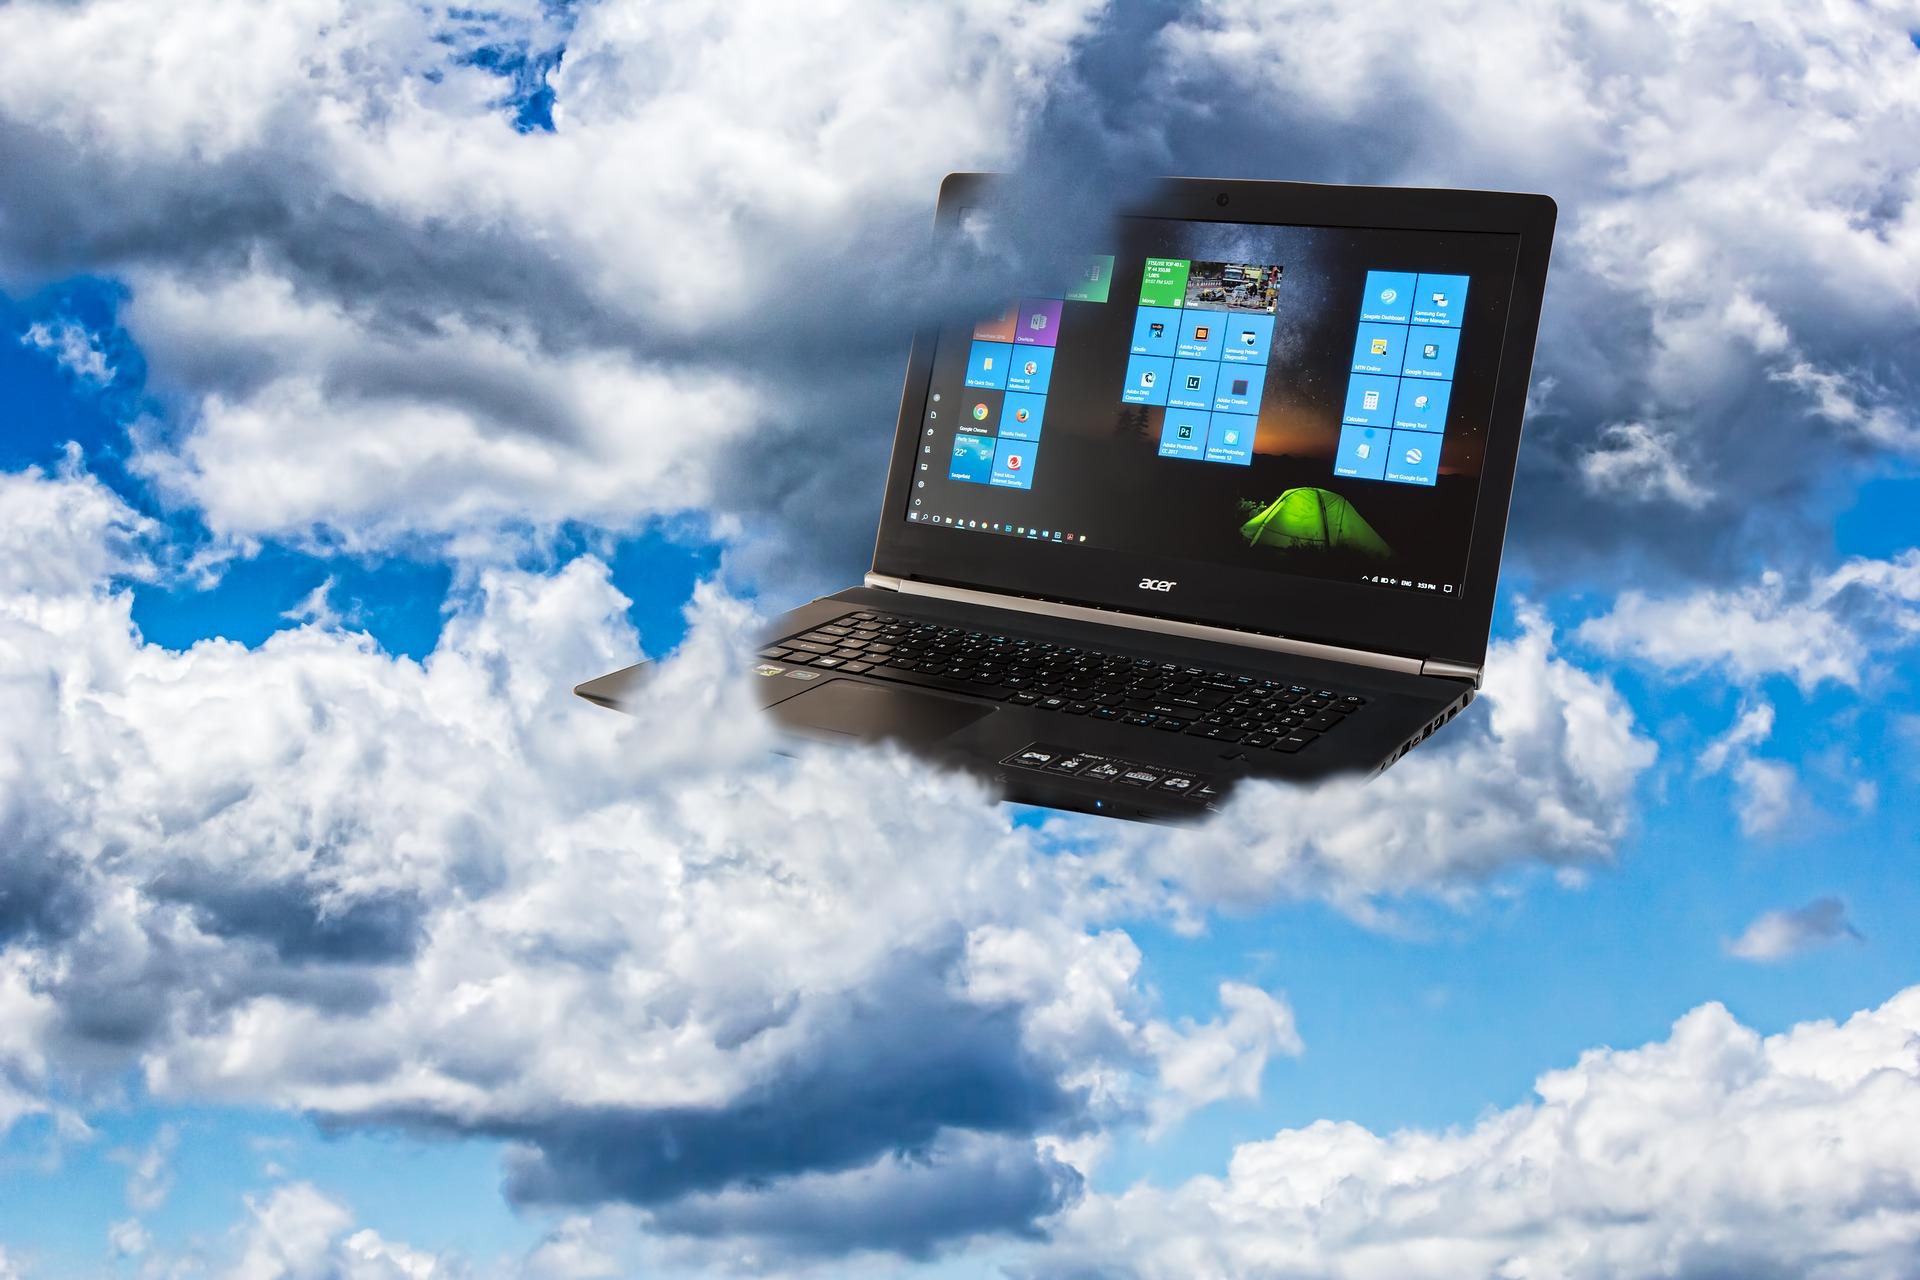 Bærbar computer med data i skyen